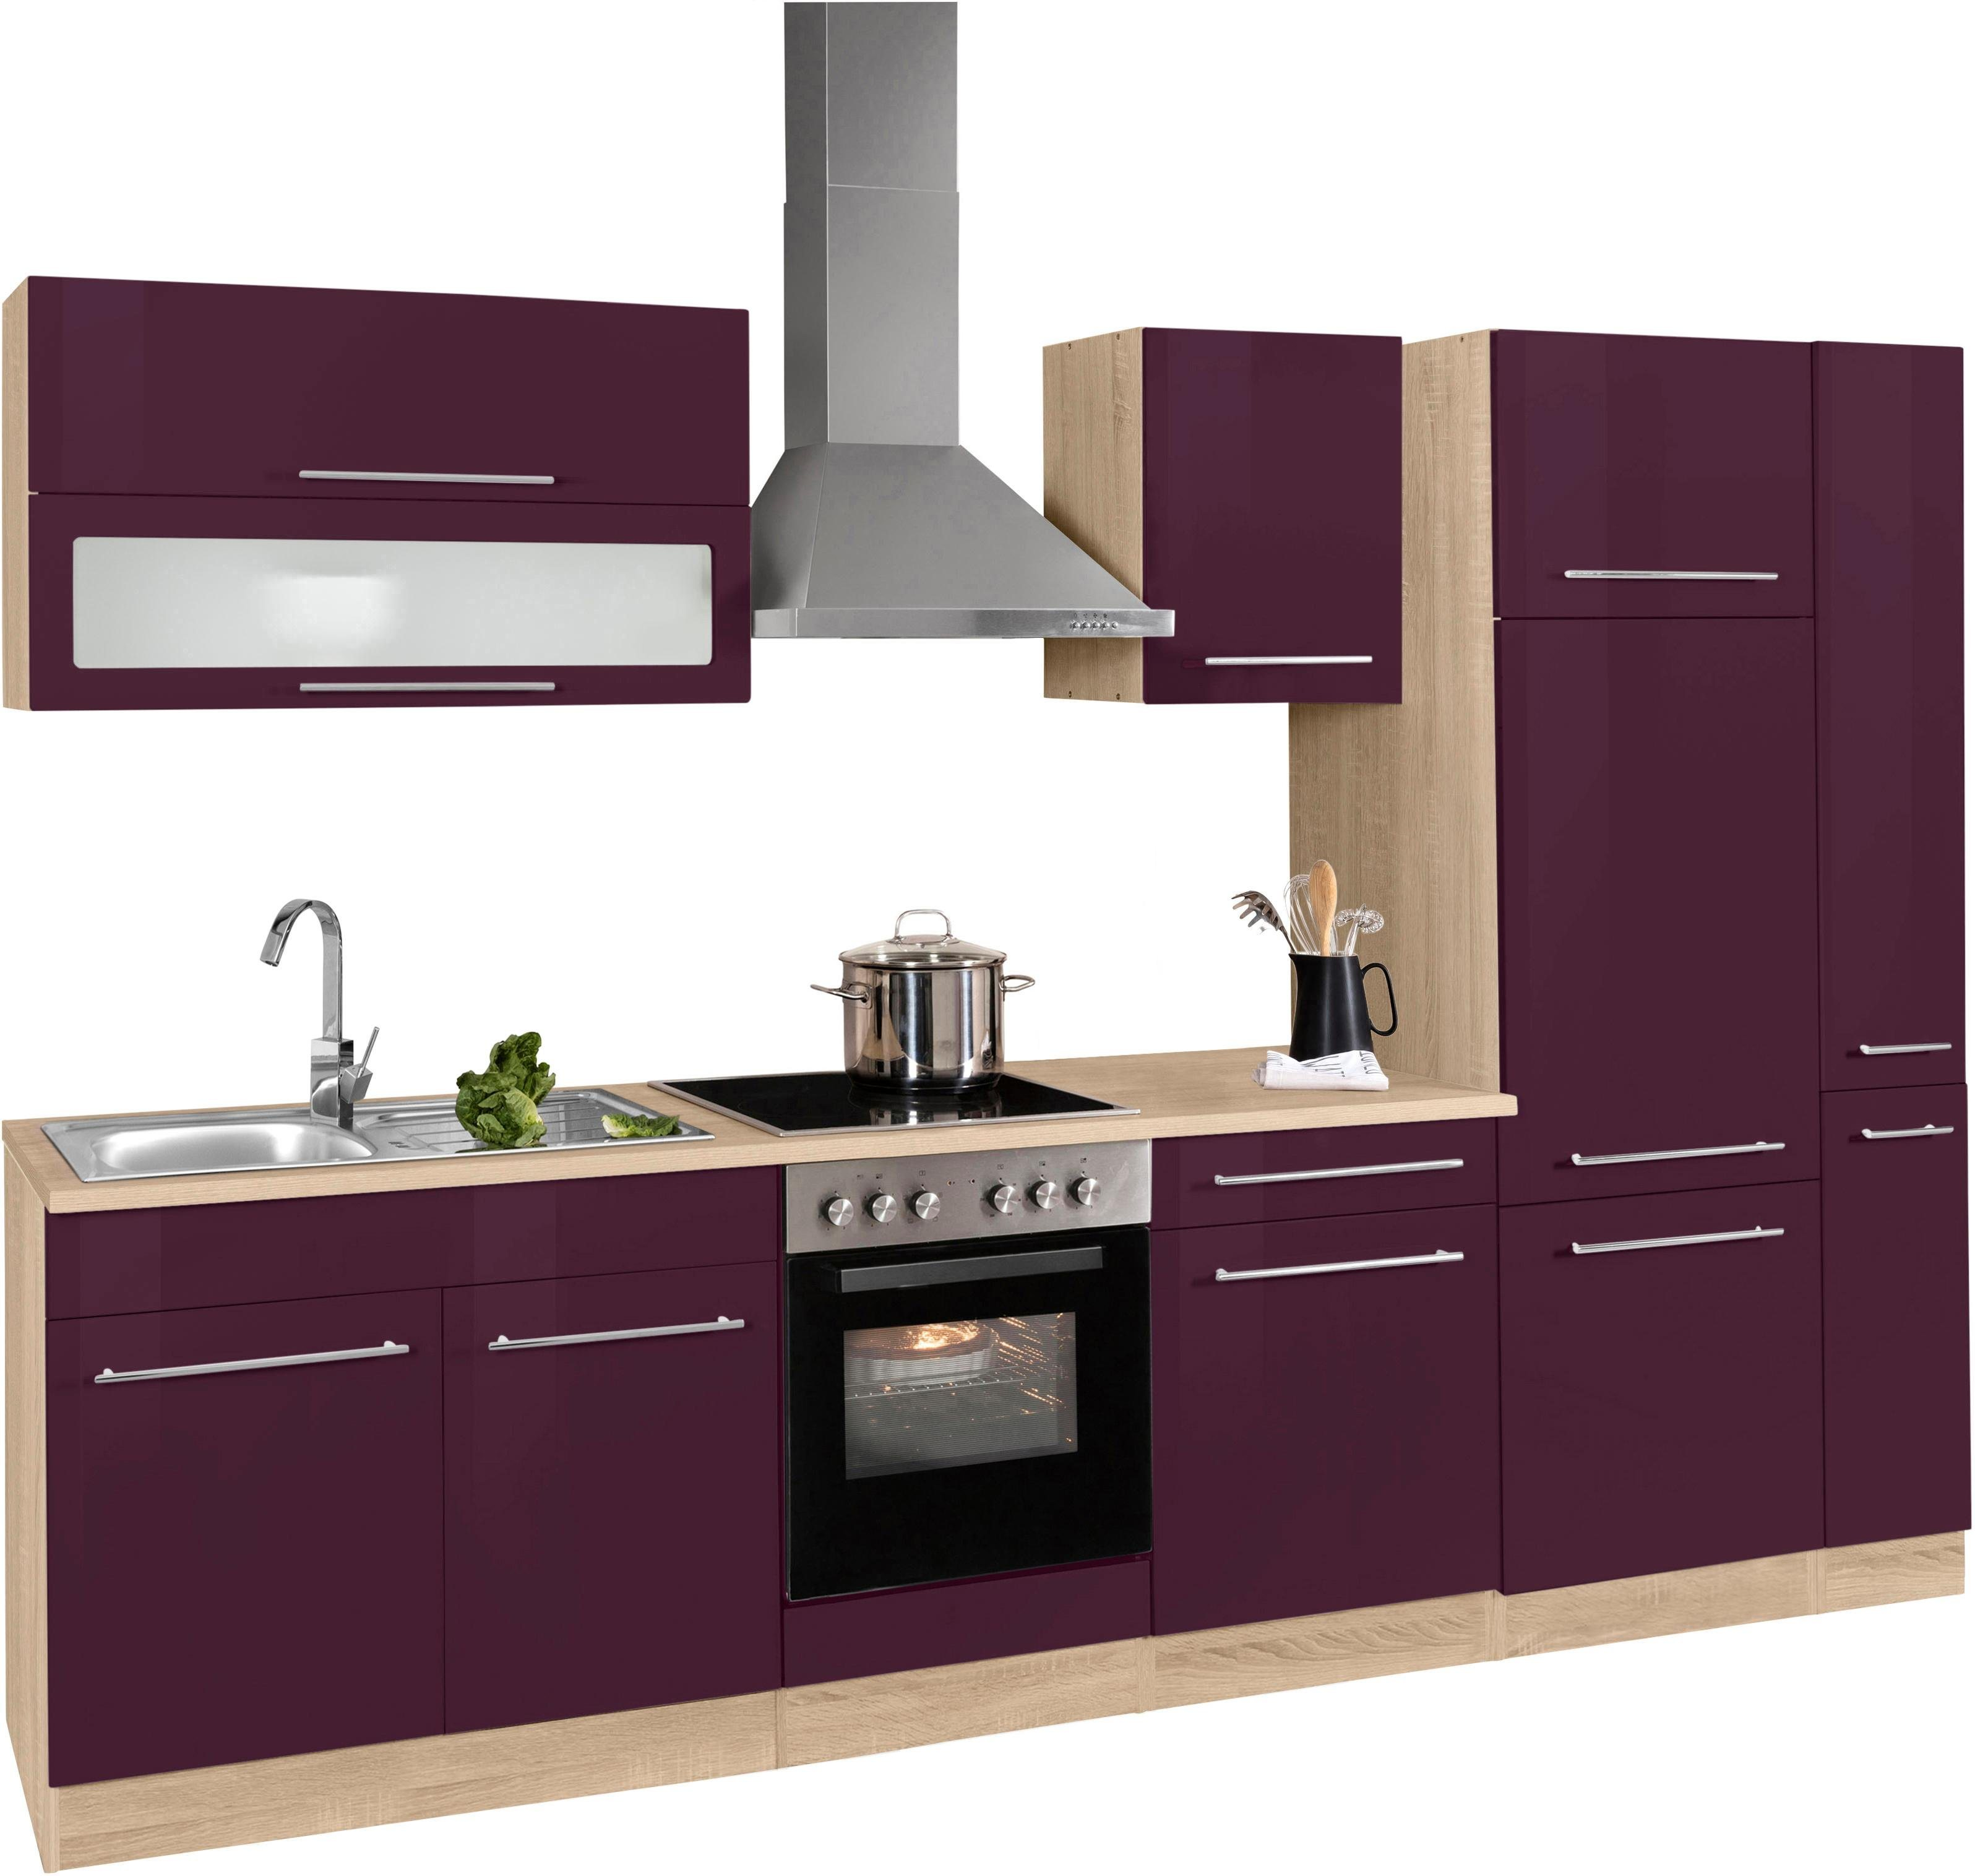 gunstige kuchenblocke mit elektrogeraten kuche kaufen 300 cm